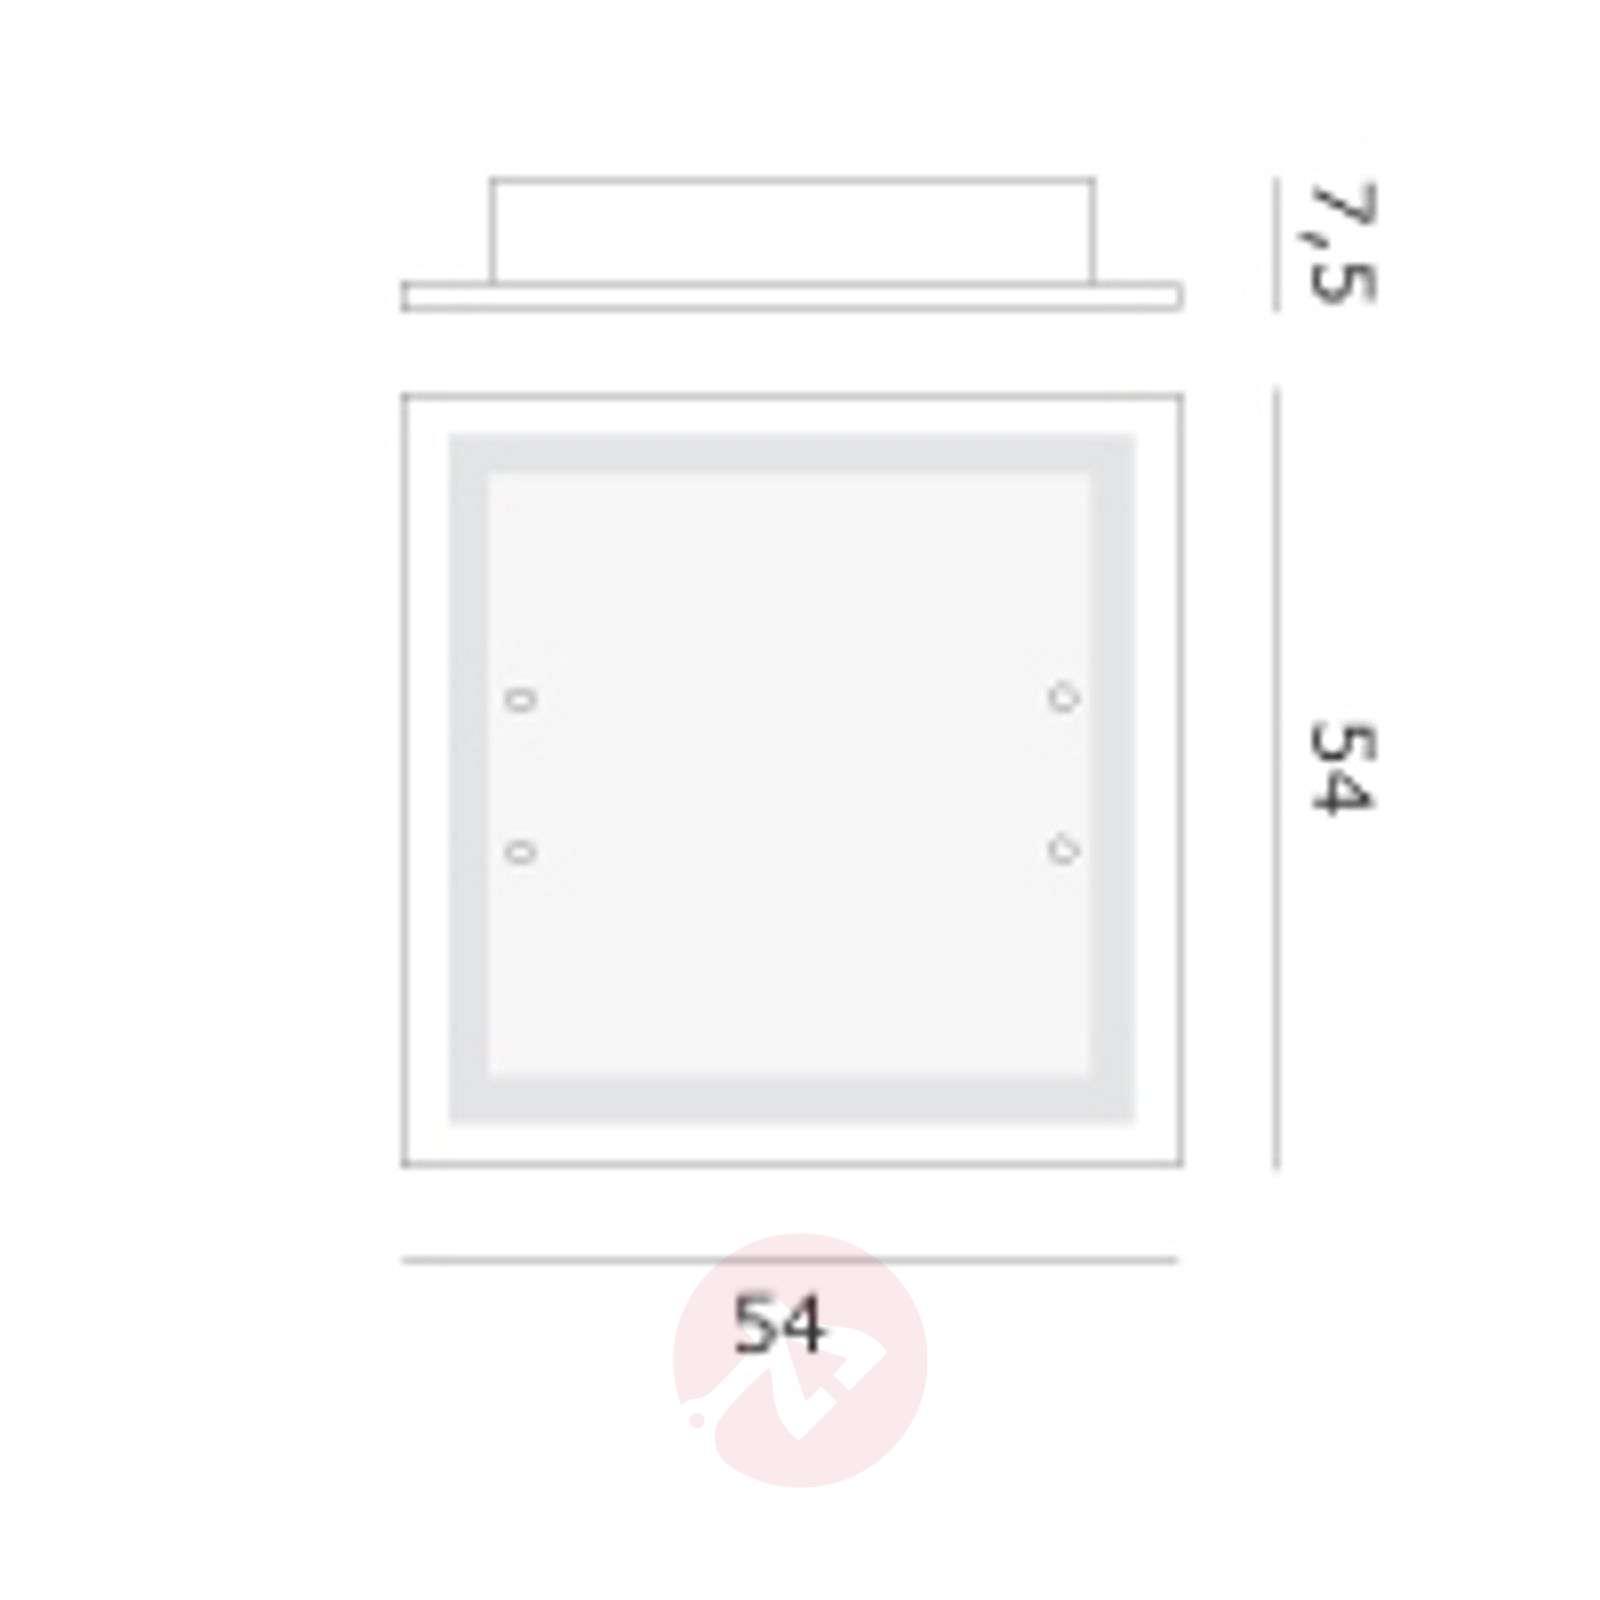 Suuri design-seinä tai kattovalaisin Quadra-2502324-01